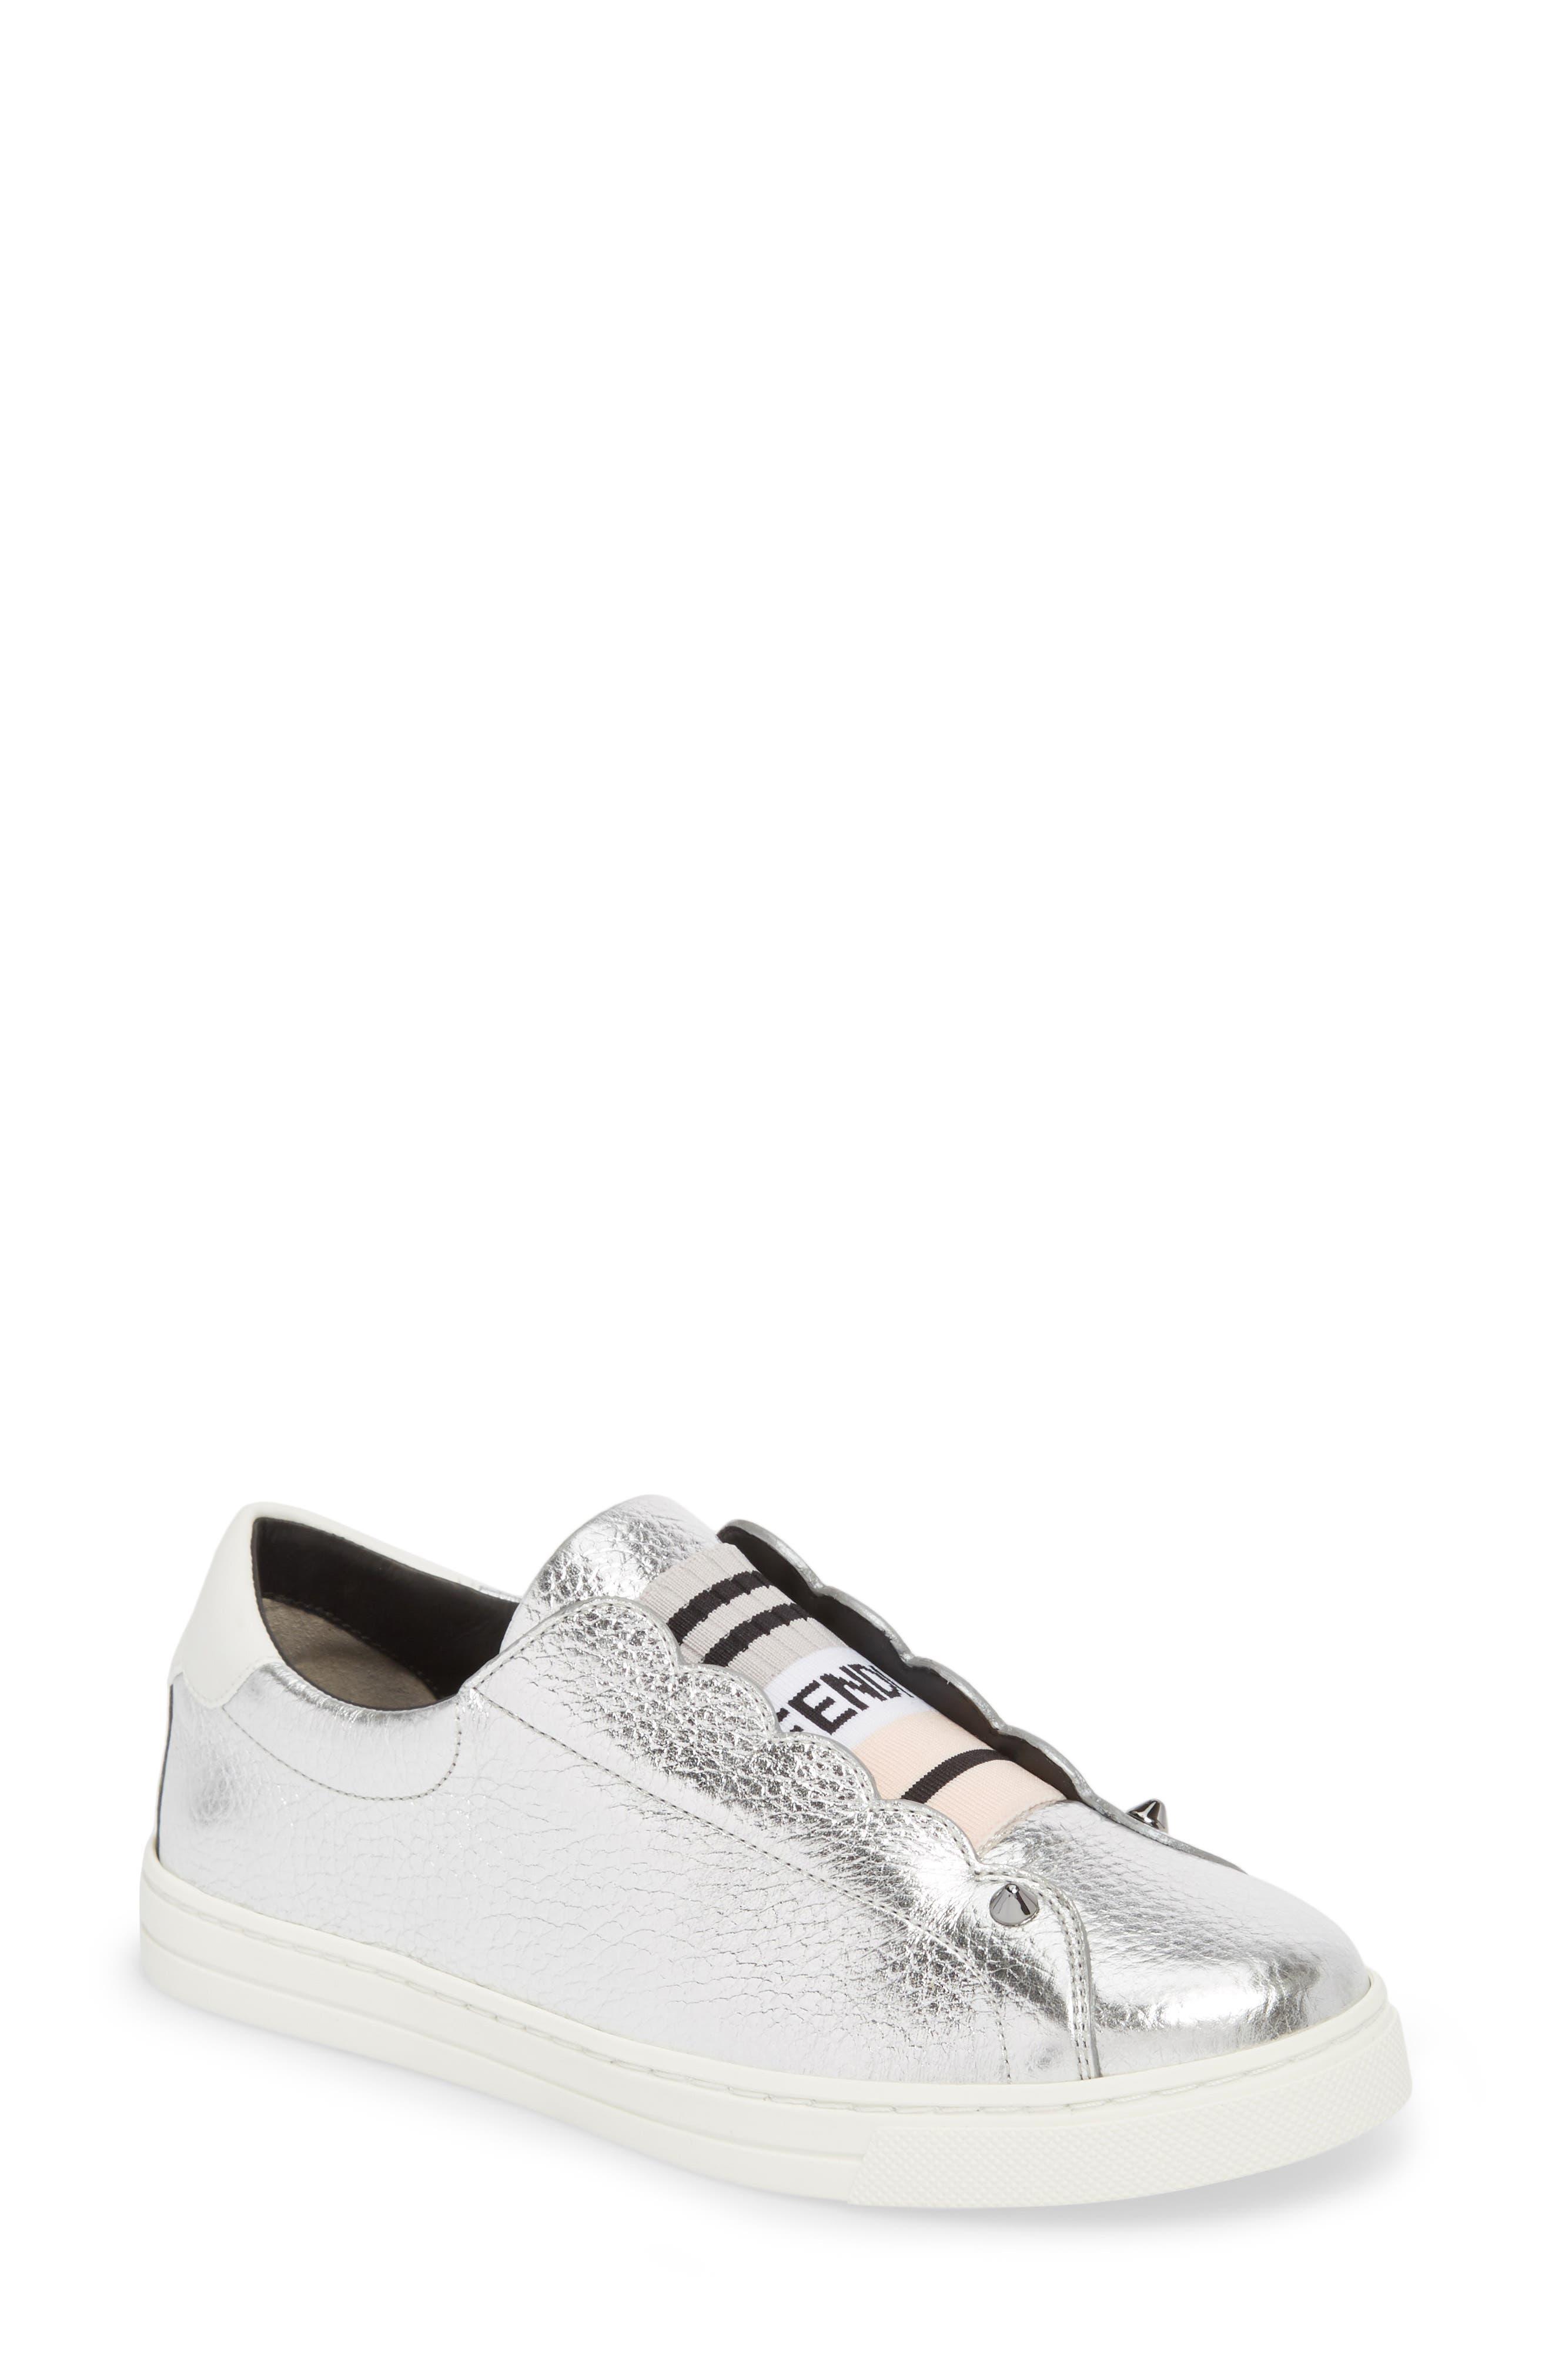 Rockono Slip-On Sneaker,                         Main,                         color, SILVER